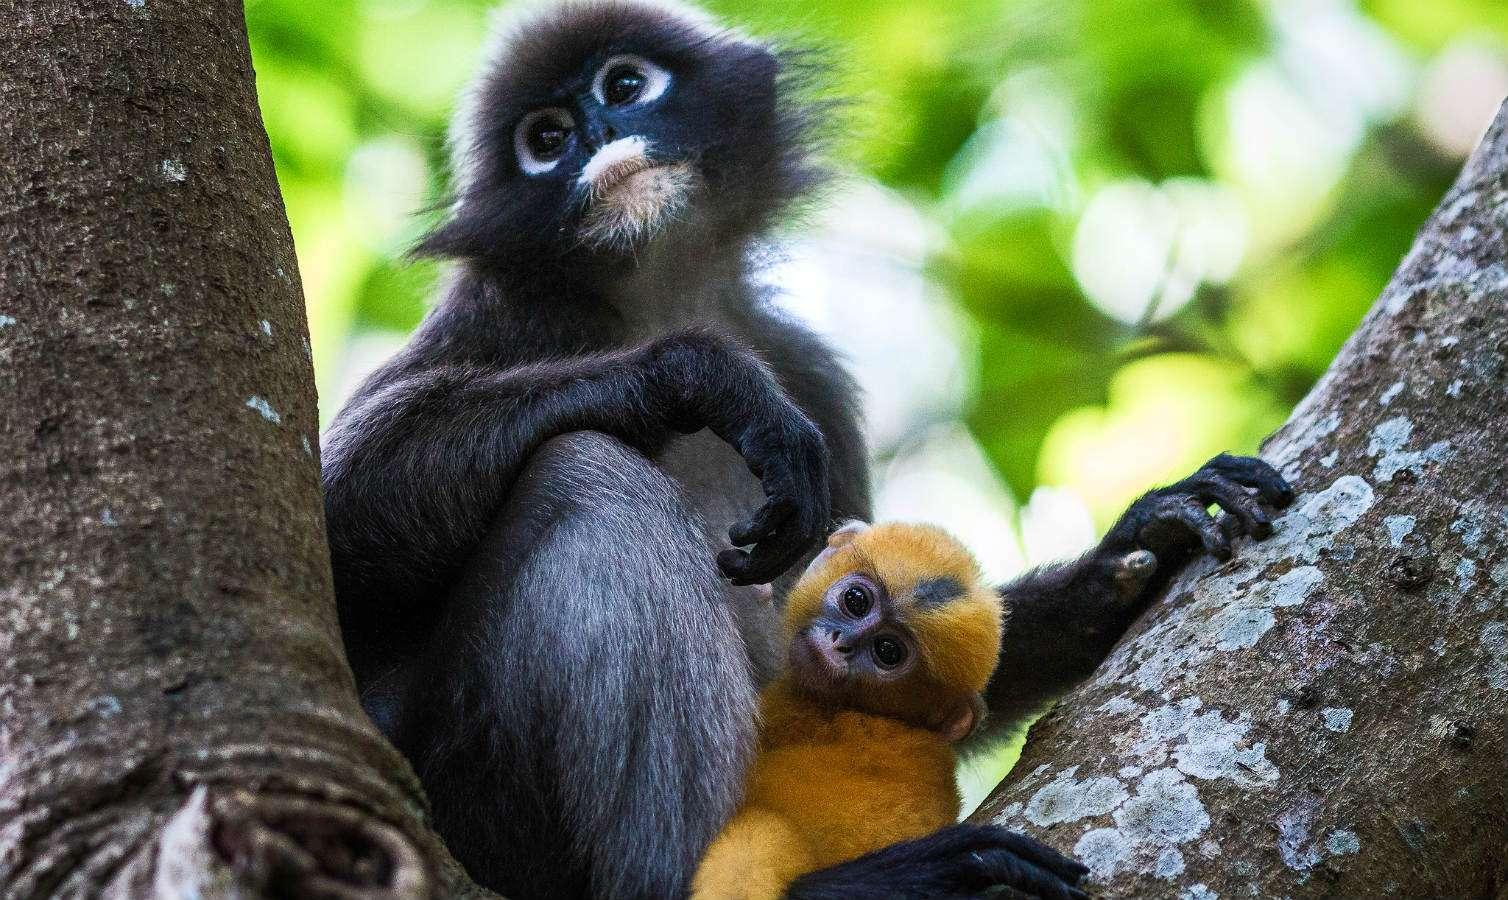 Moeder Brilangoer met nog geel baby Brillangoer aapje in boom van Railay East